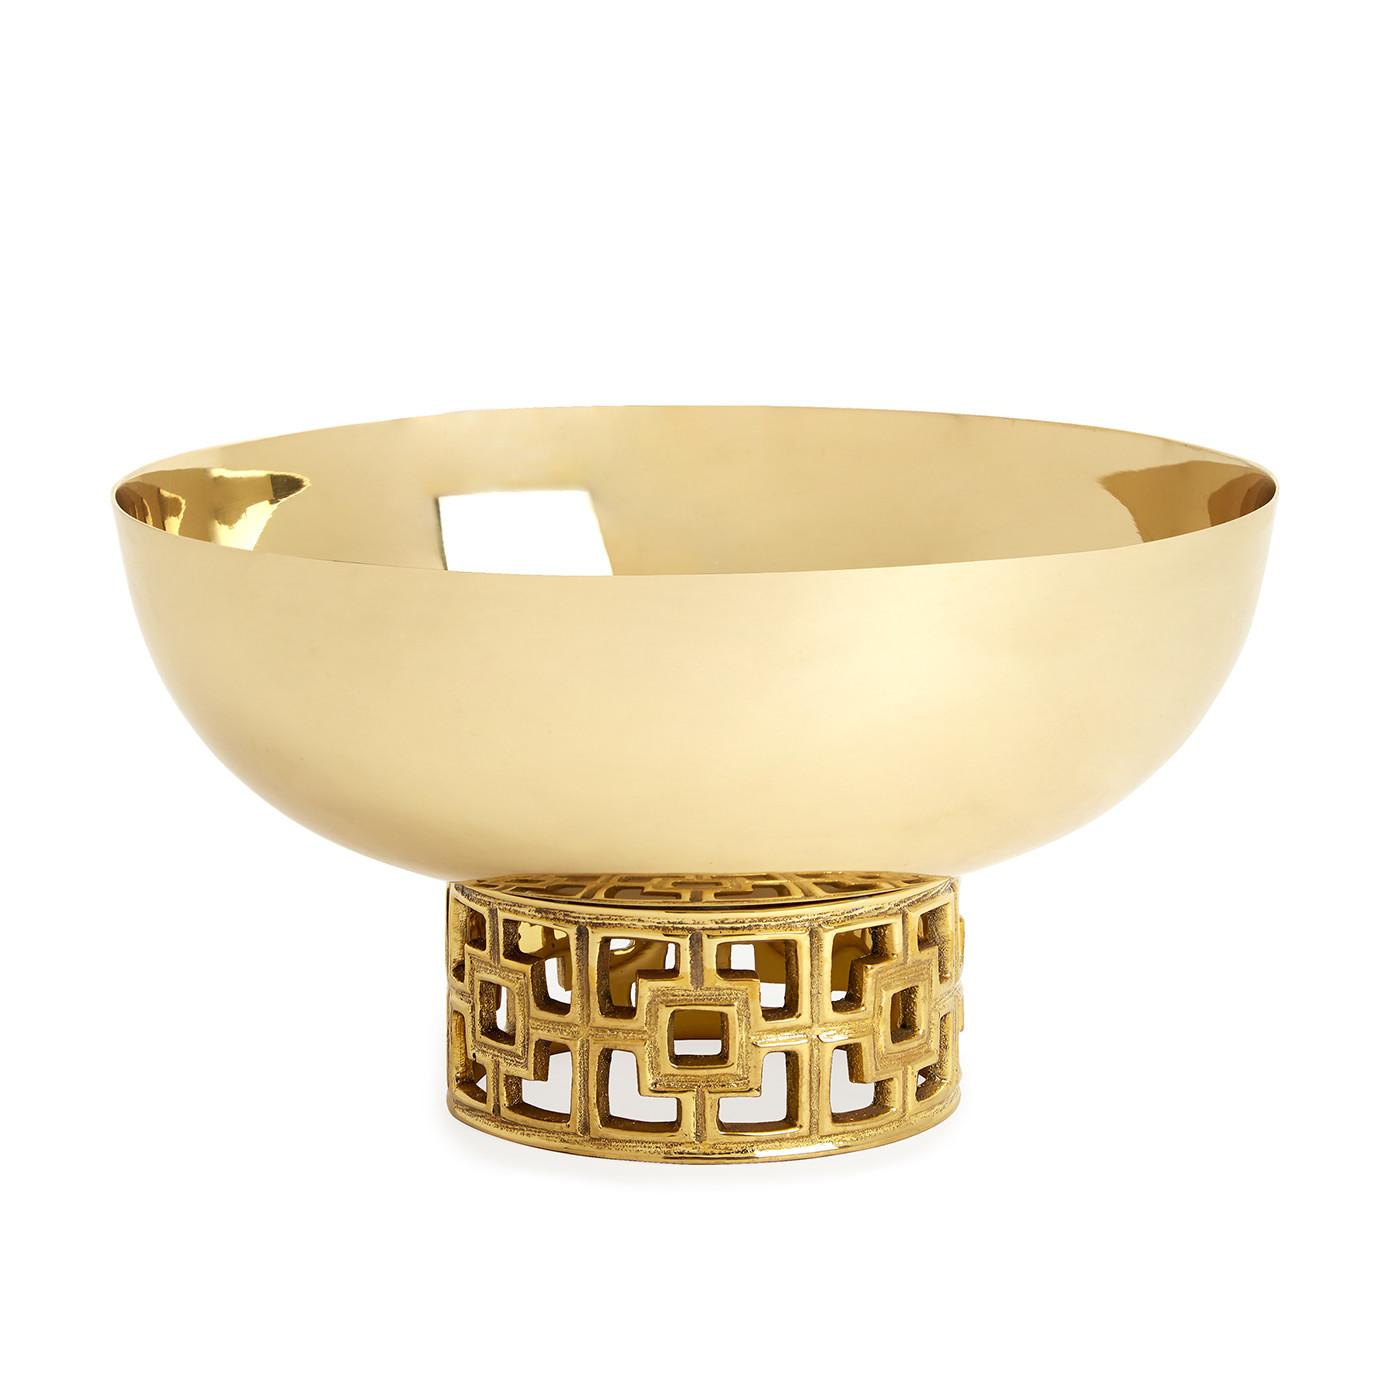 Nixon Centerpiece Bowl